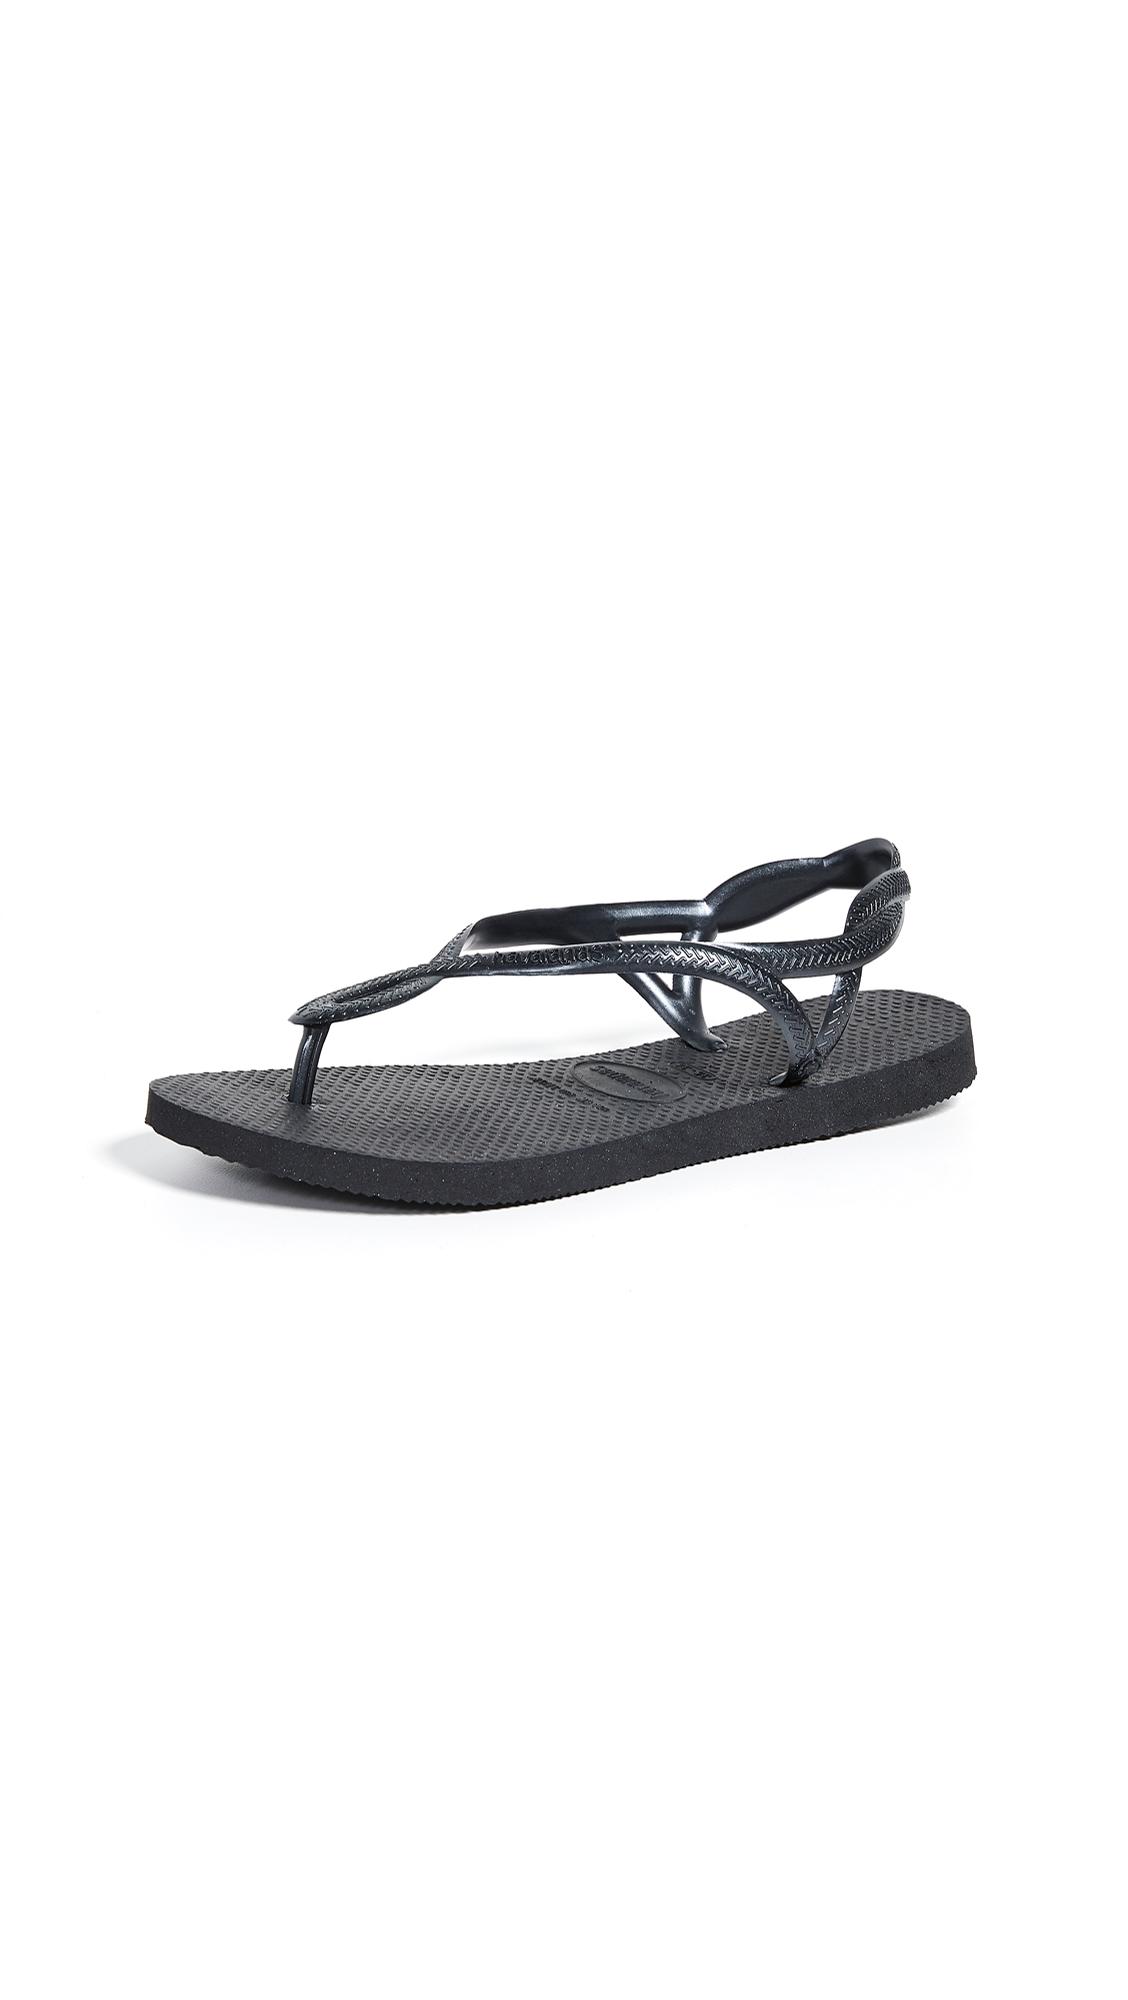 Havaianas Luna Sandals - Black